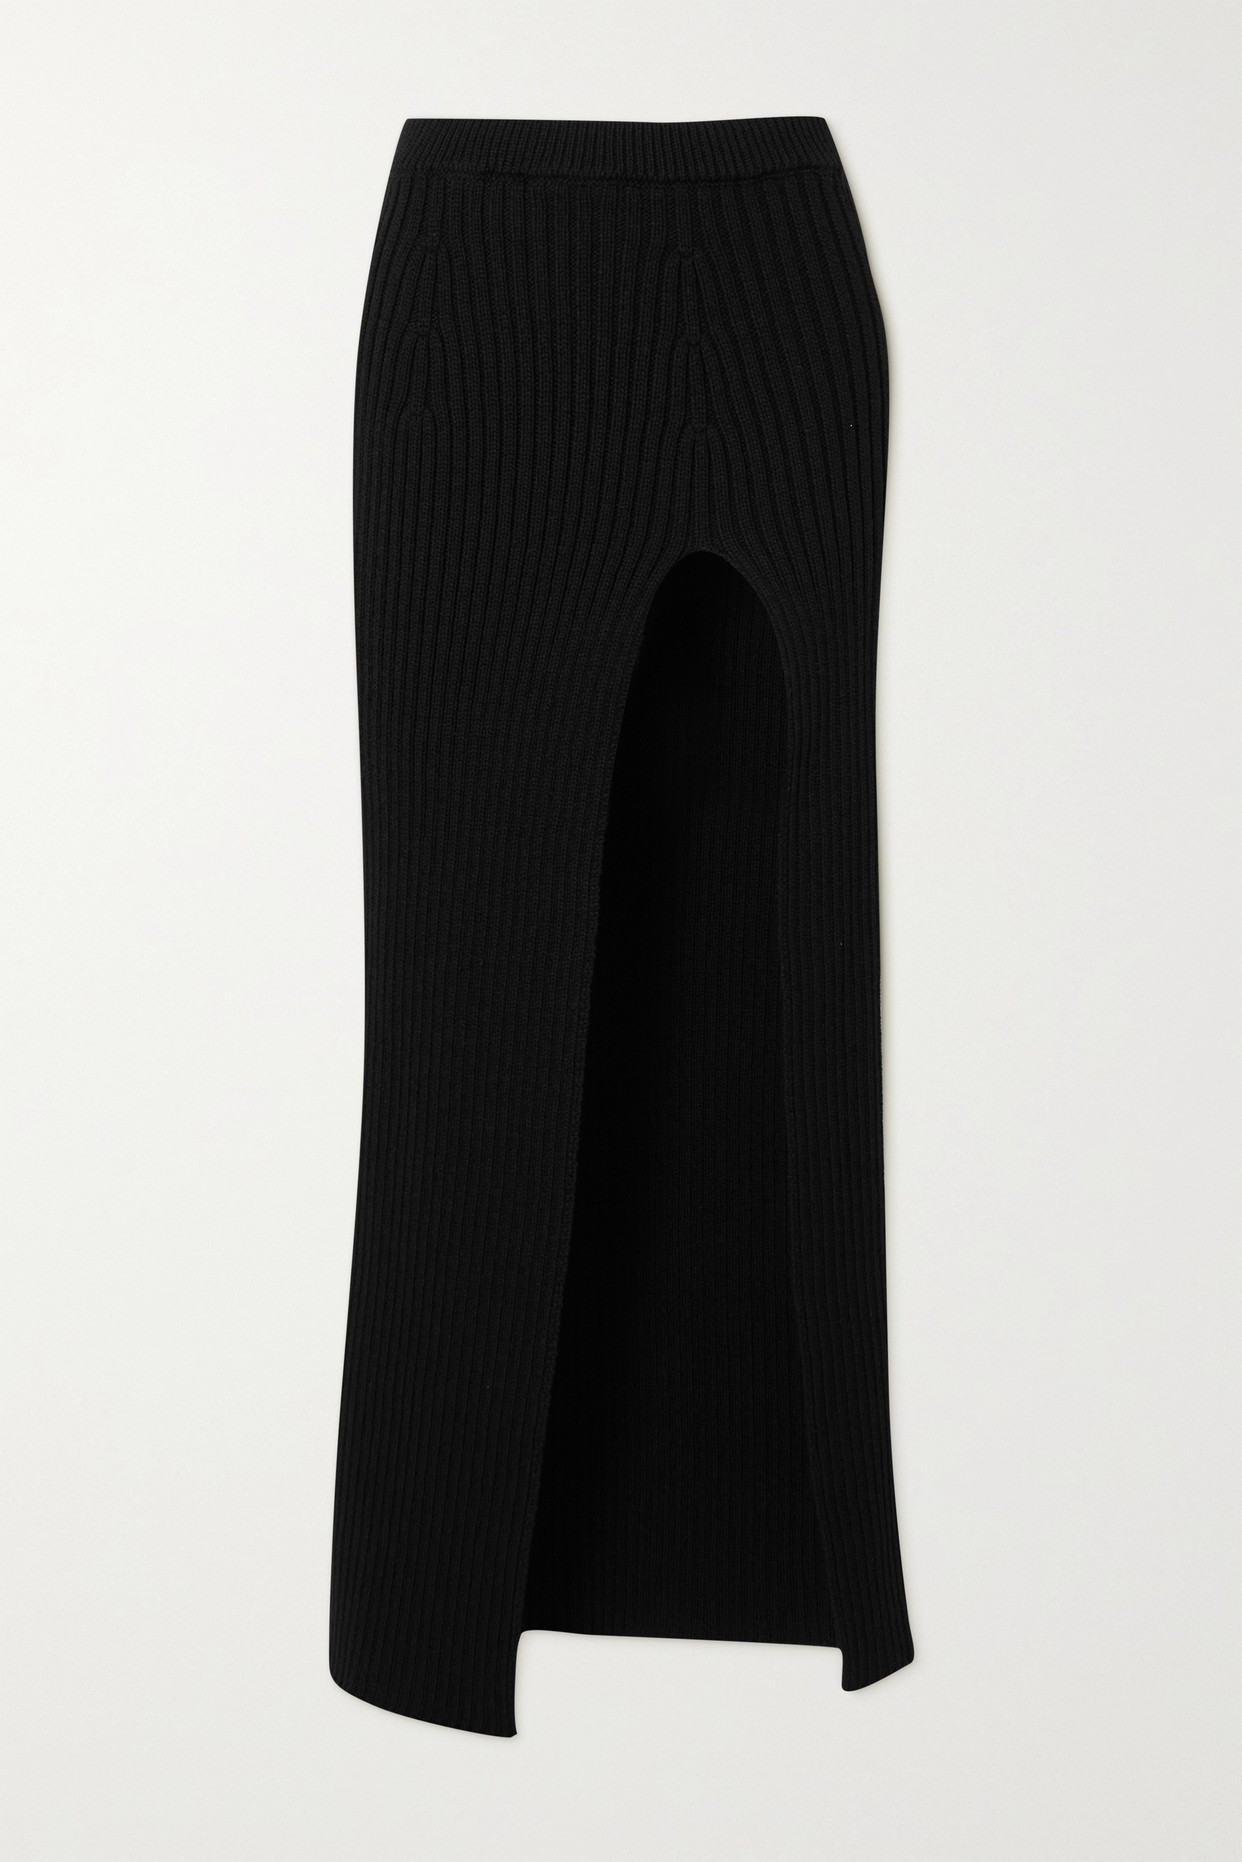 MERYLL ROGGE - Ribbed Wool Maxi Skirt - Black - medium